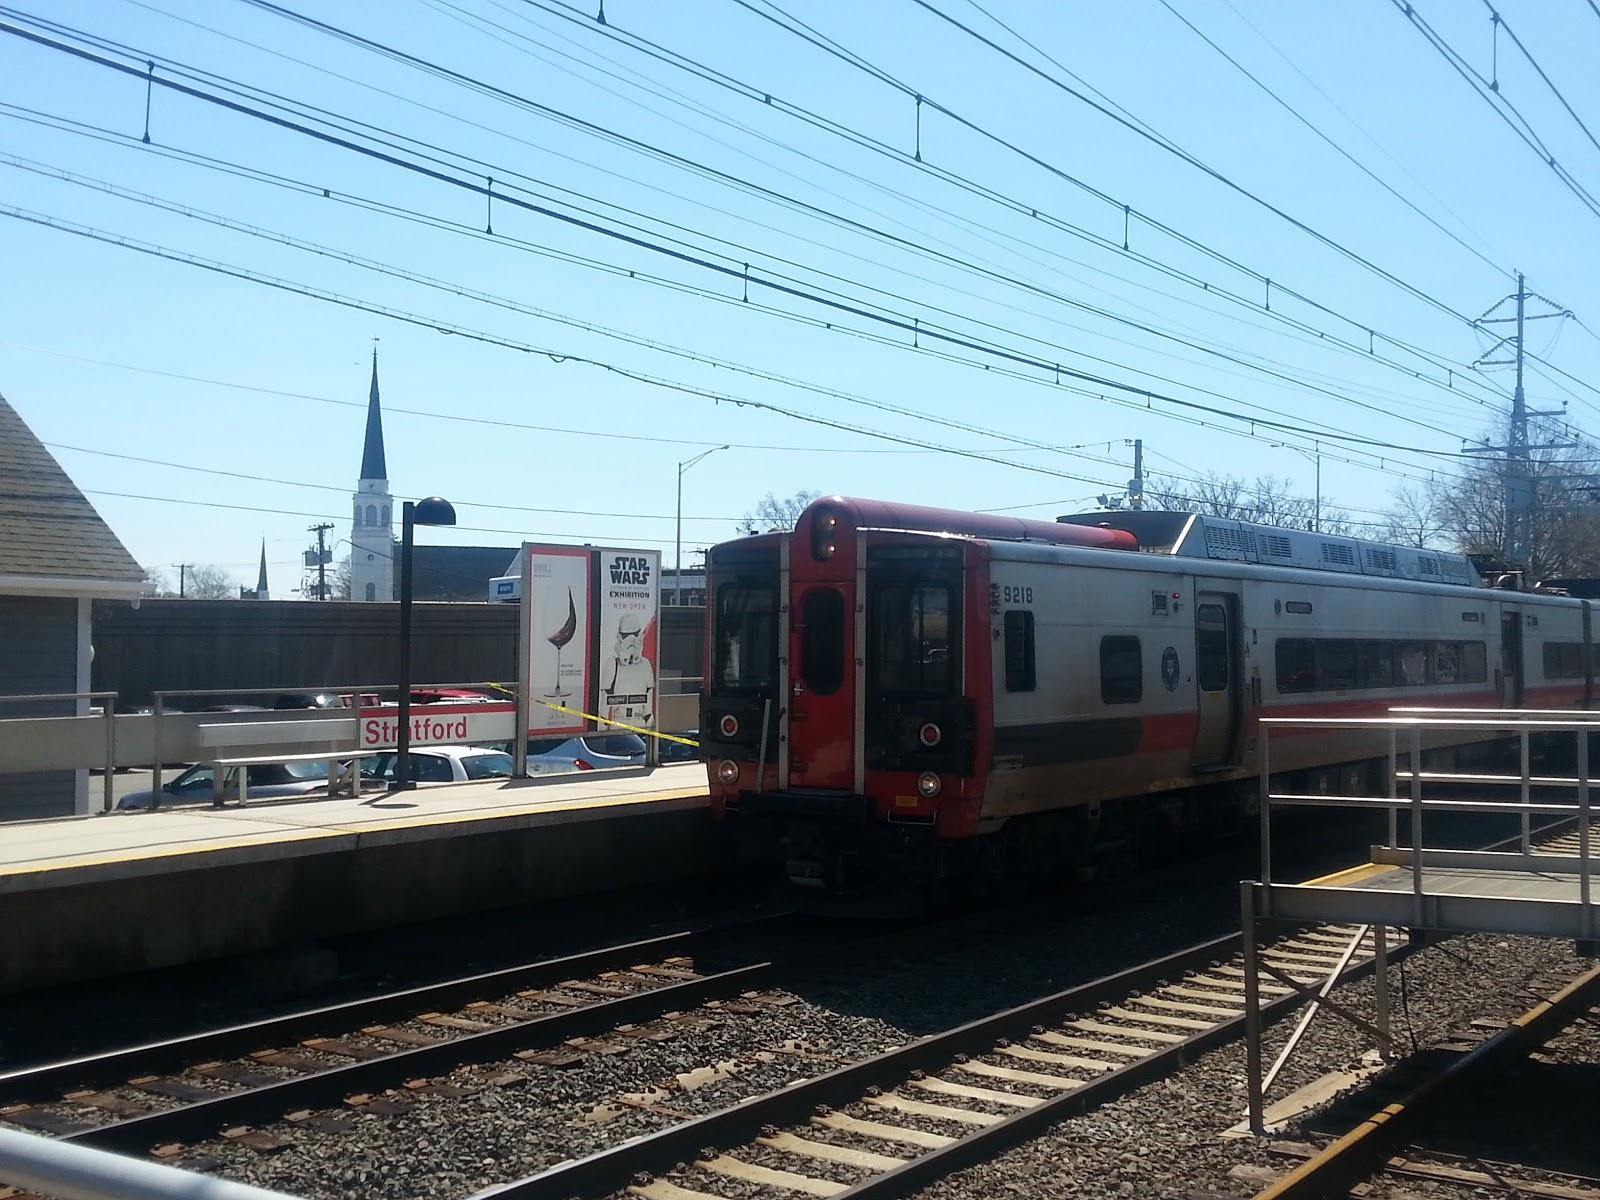 Man dies after being struck by train at Stratford train station